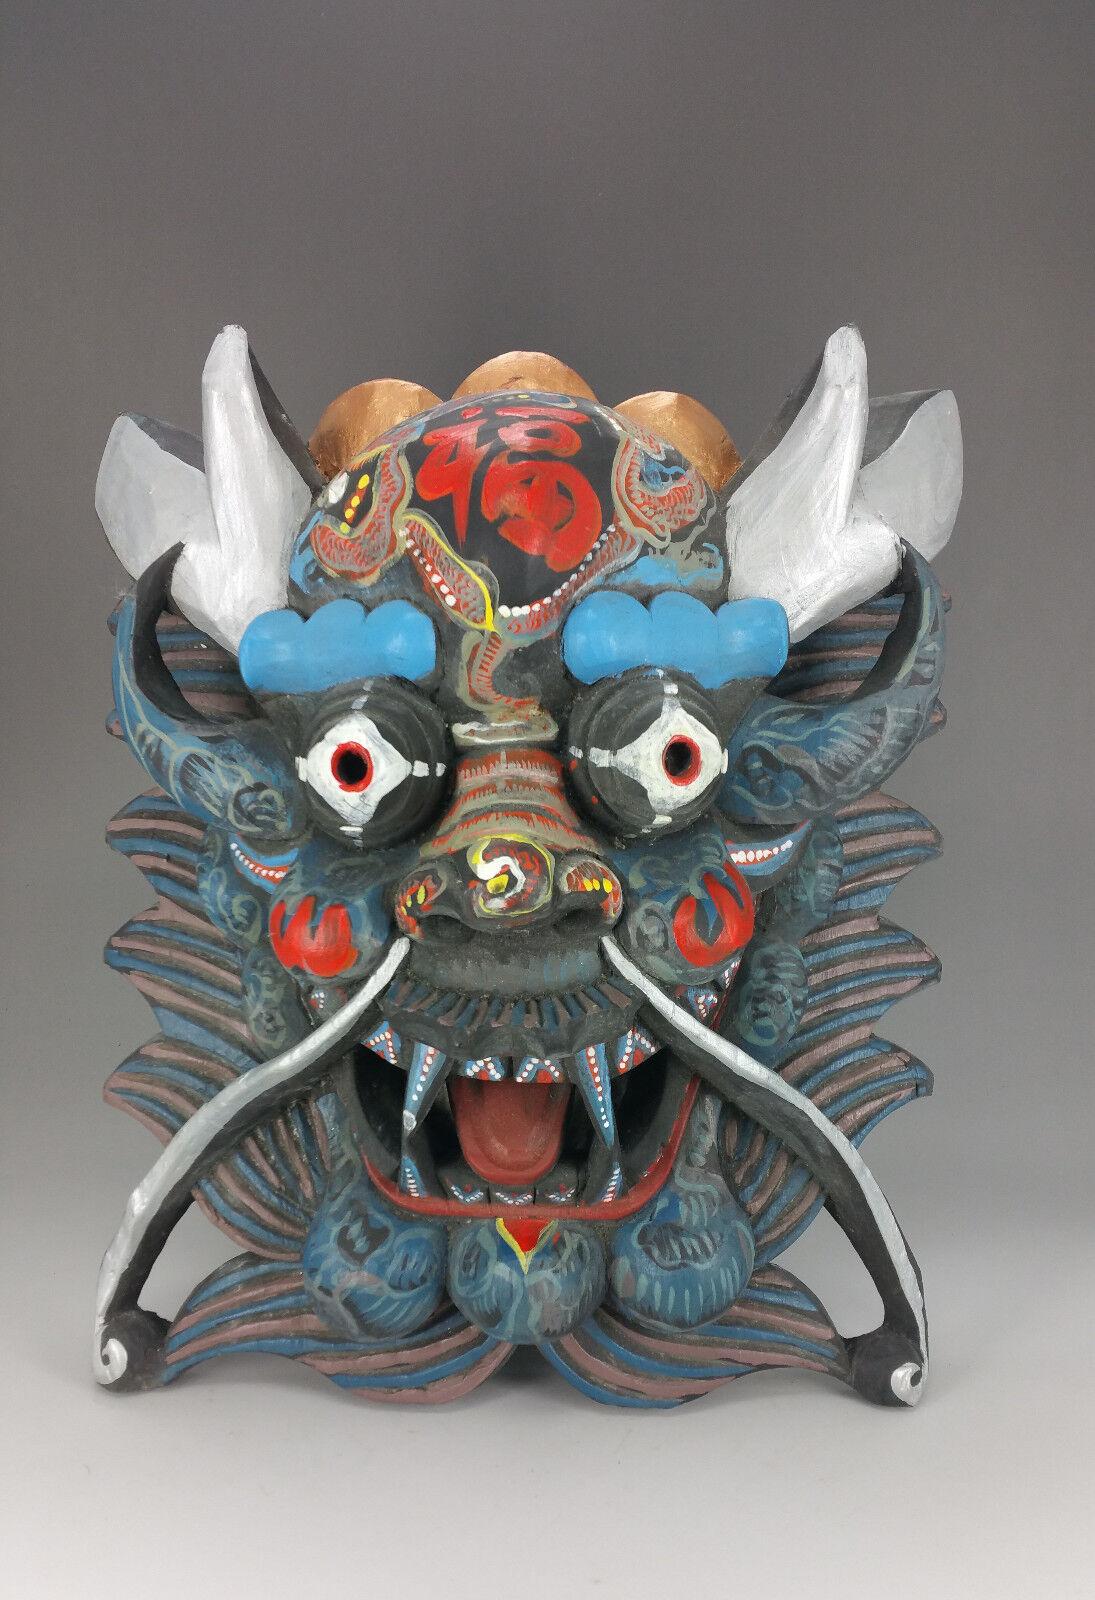 Dharmapala maschera in legno, interamente a mano, muro BUDDHA buddismo cm 32 [c29991]